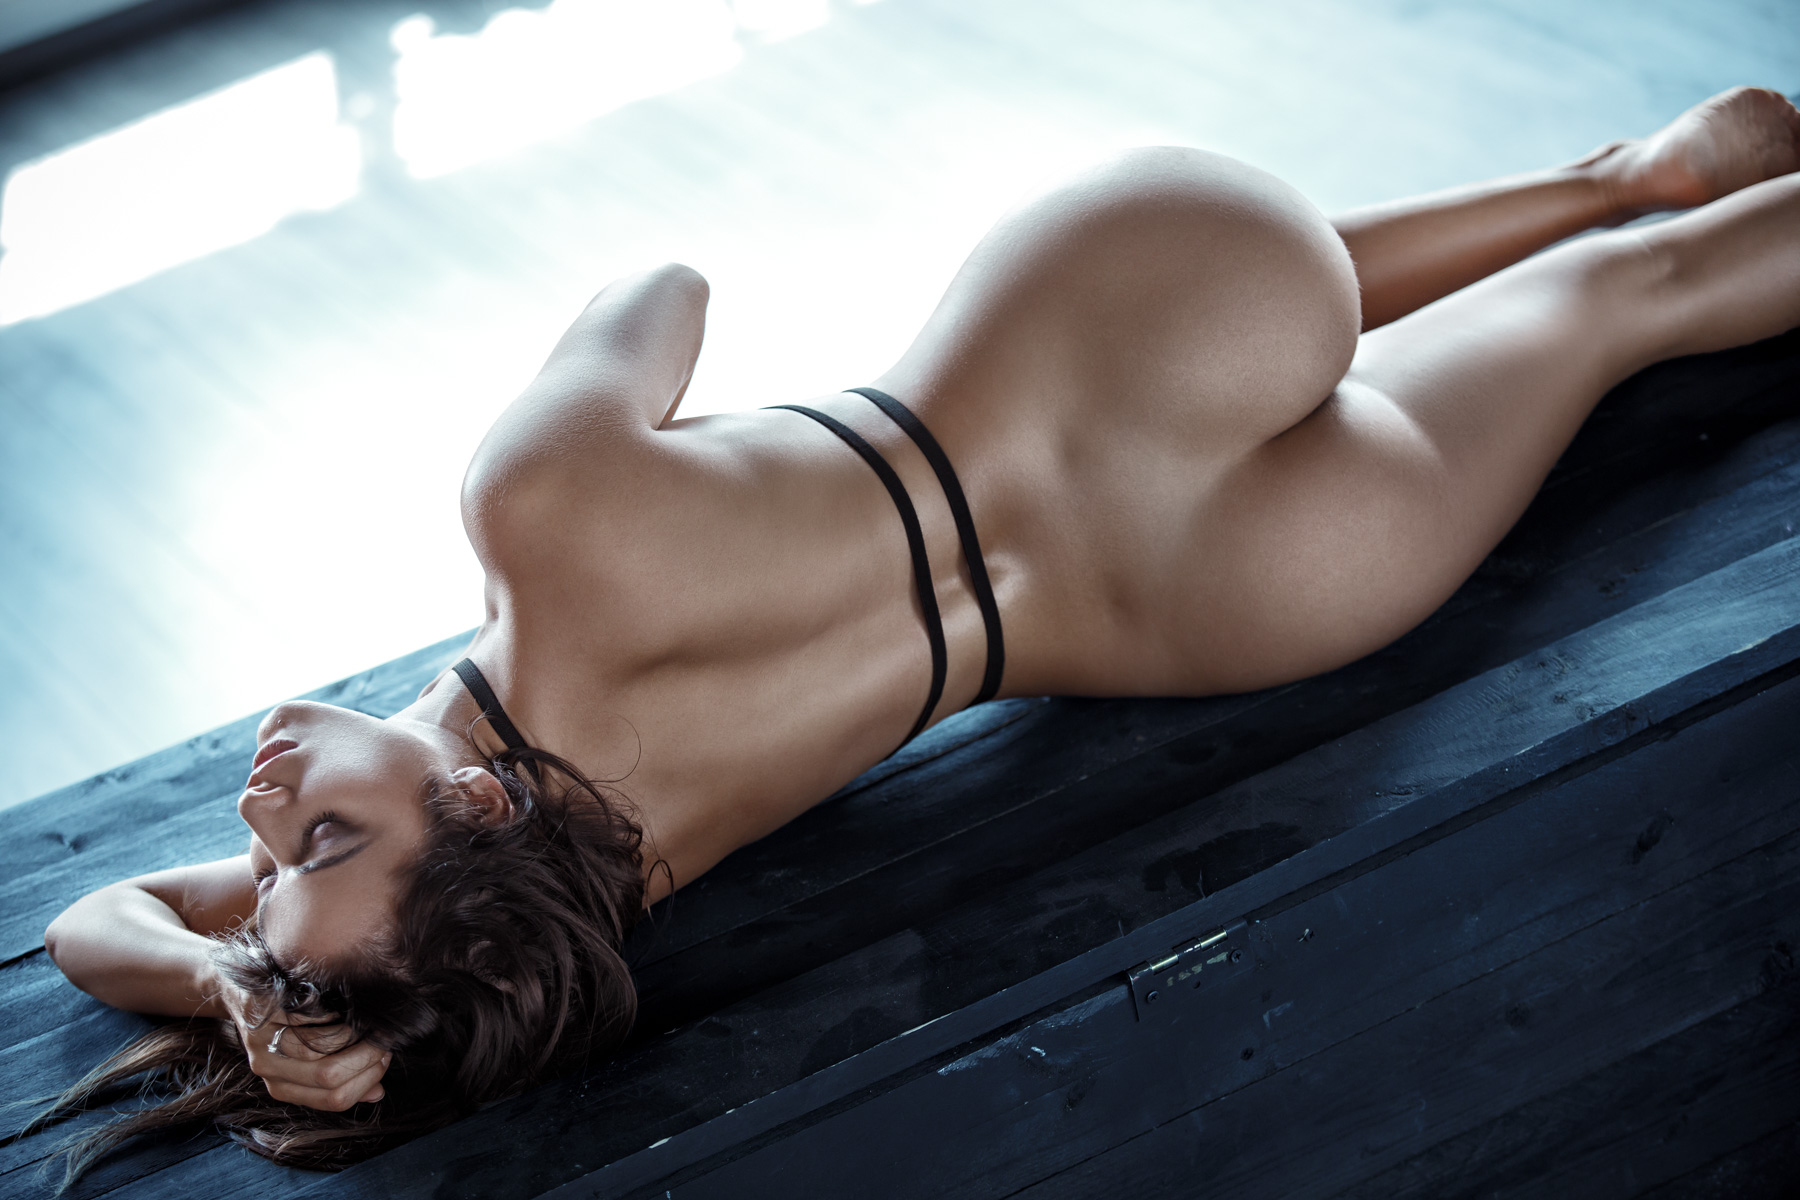 Celine Russo